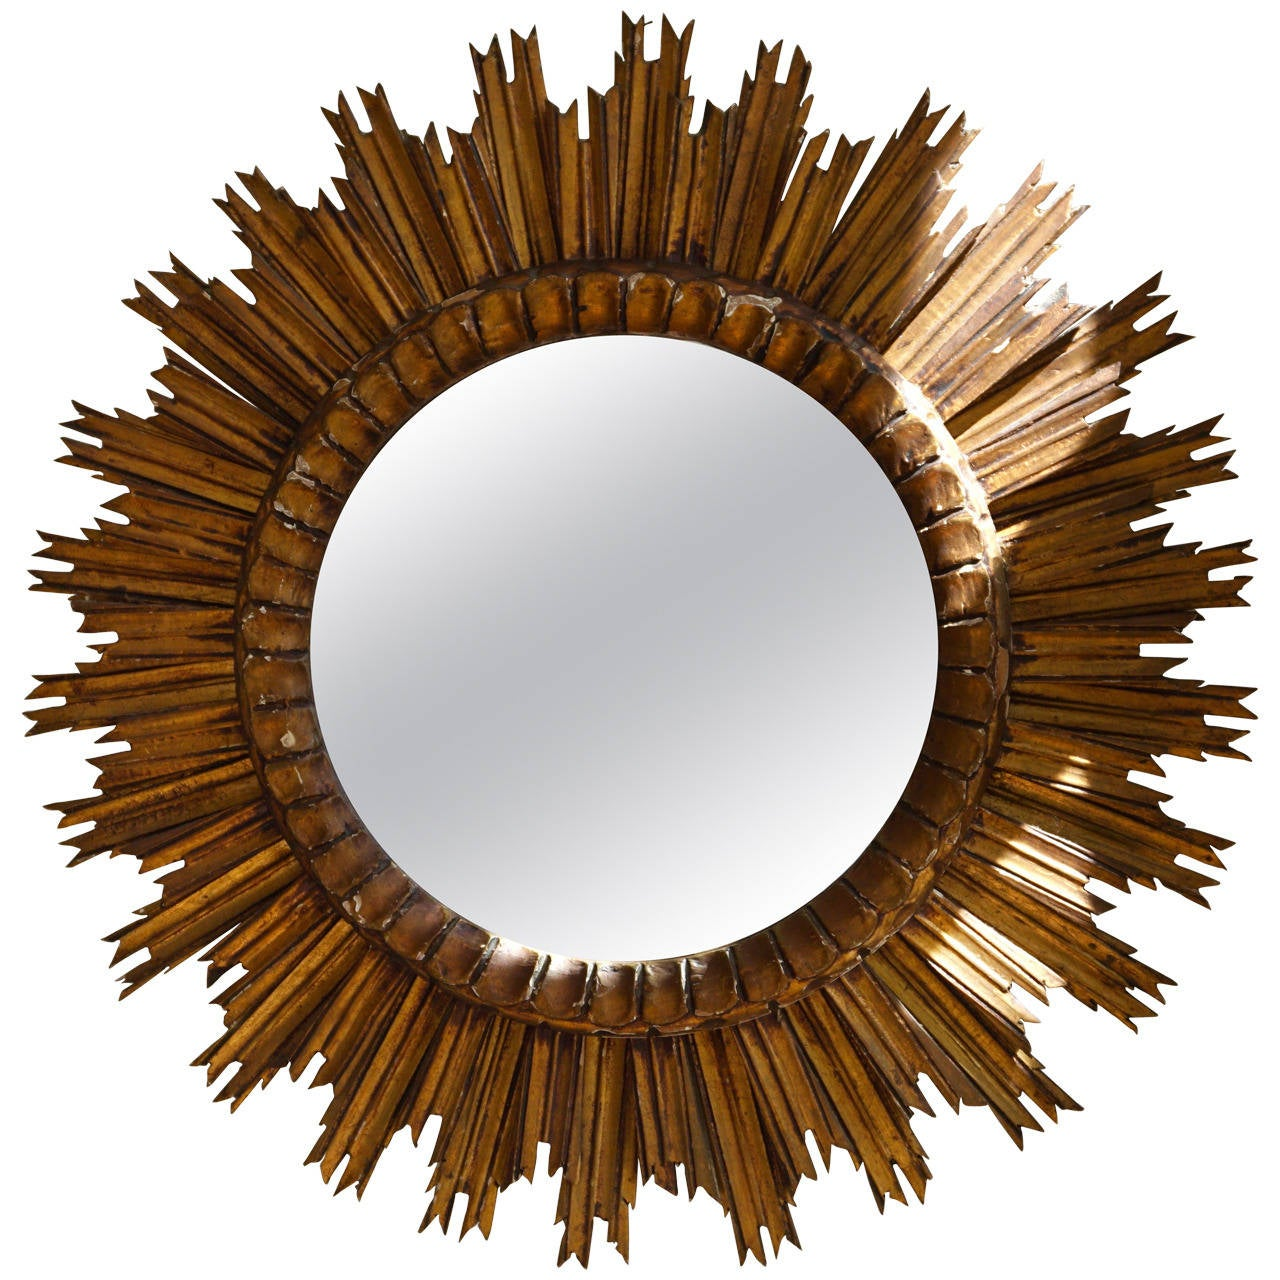 Italian 1930s soleil sunburst giltwood wall mirror for for Sunburst mirror